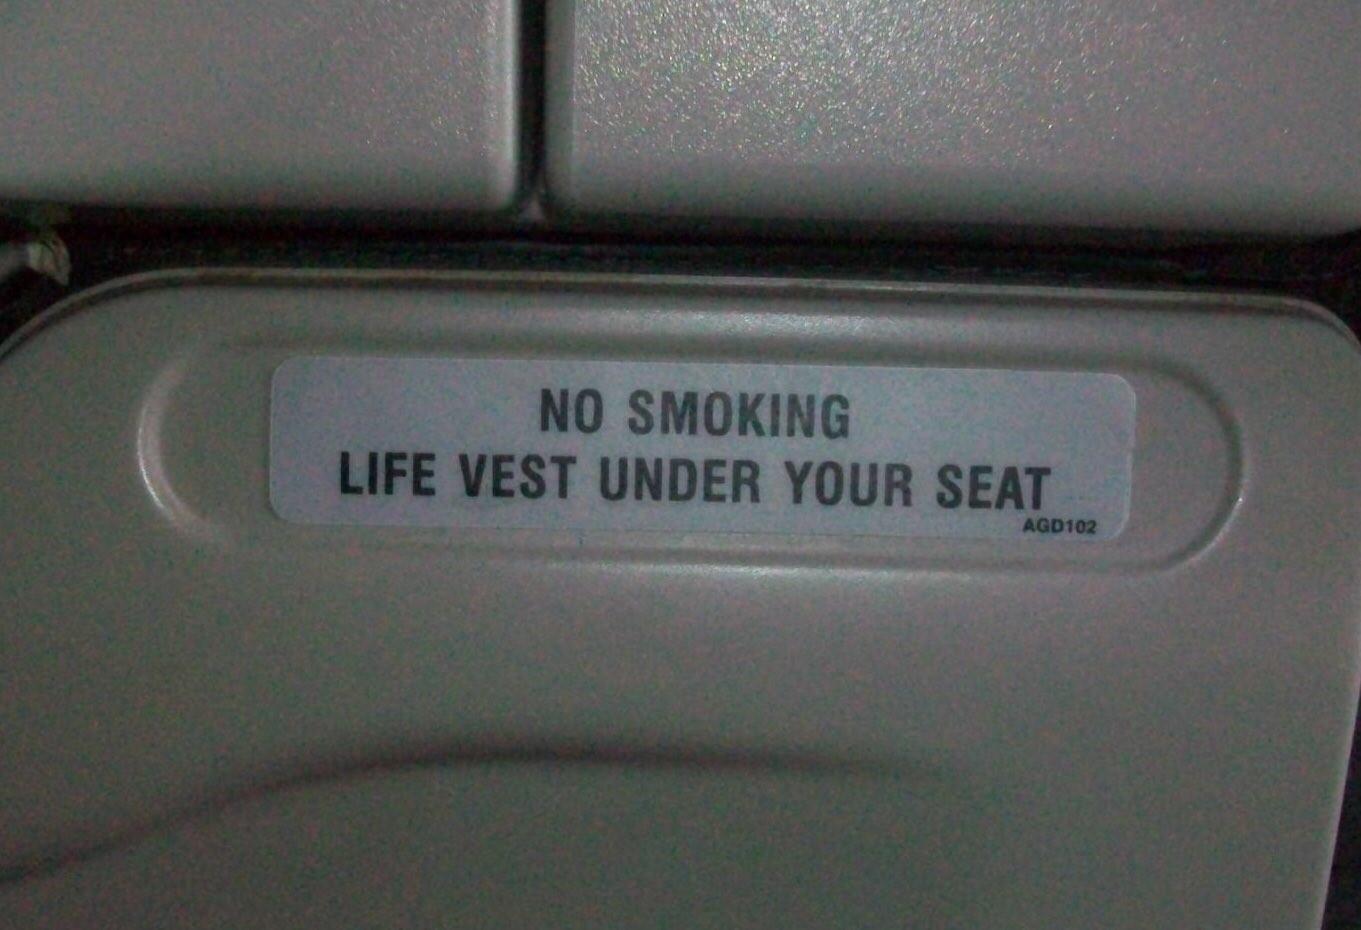 No Smoking Lifevest edit error